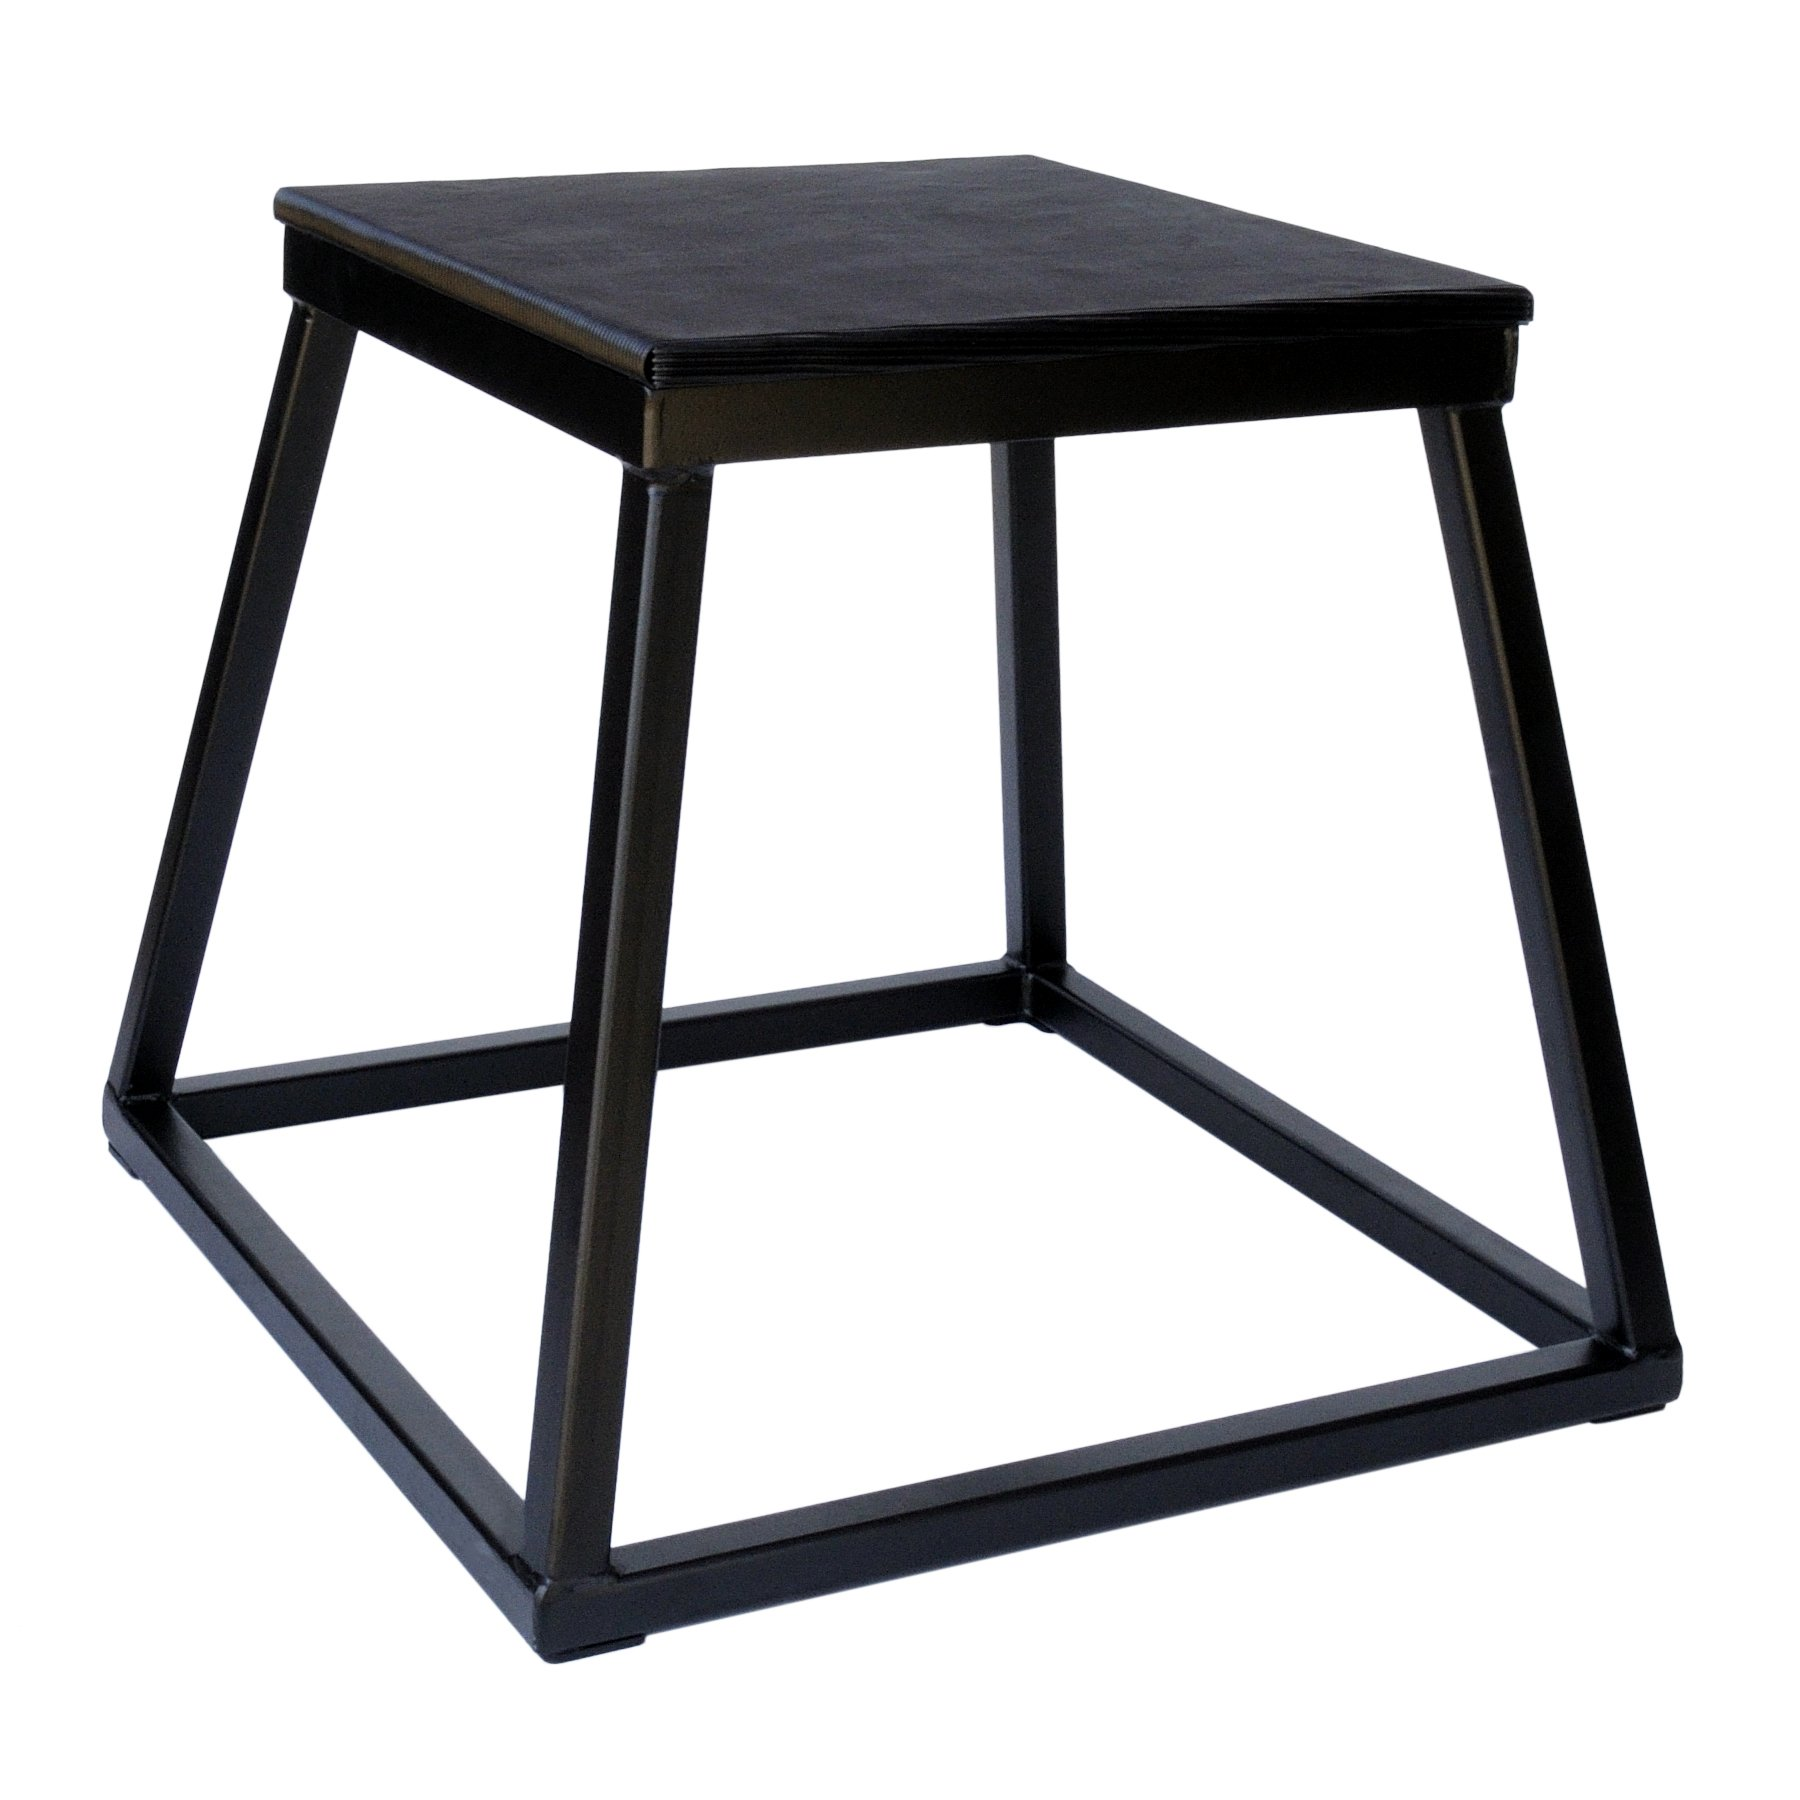 Ader Plyometric Platform Box- 18'' Black